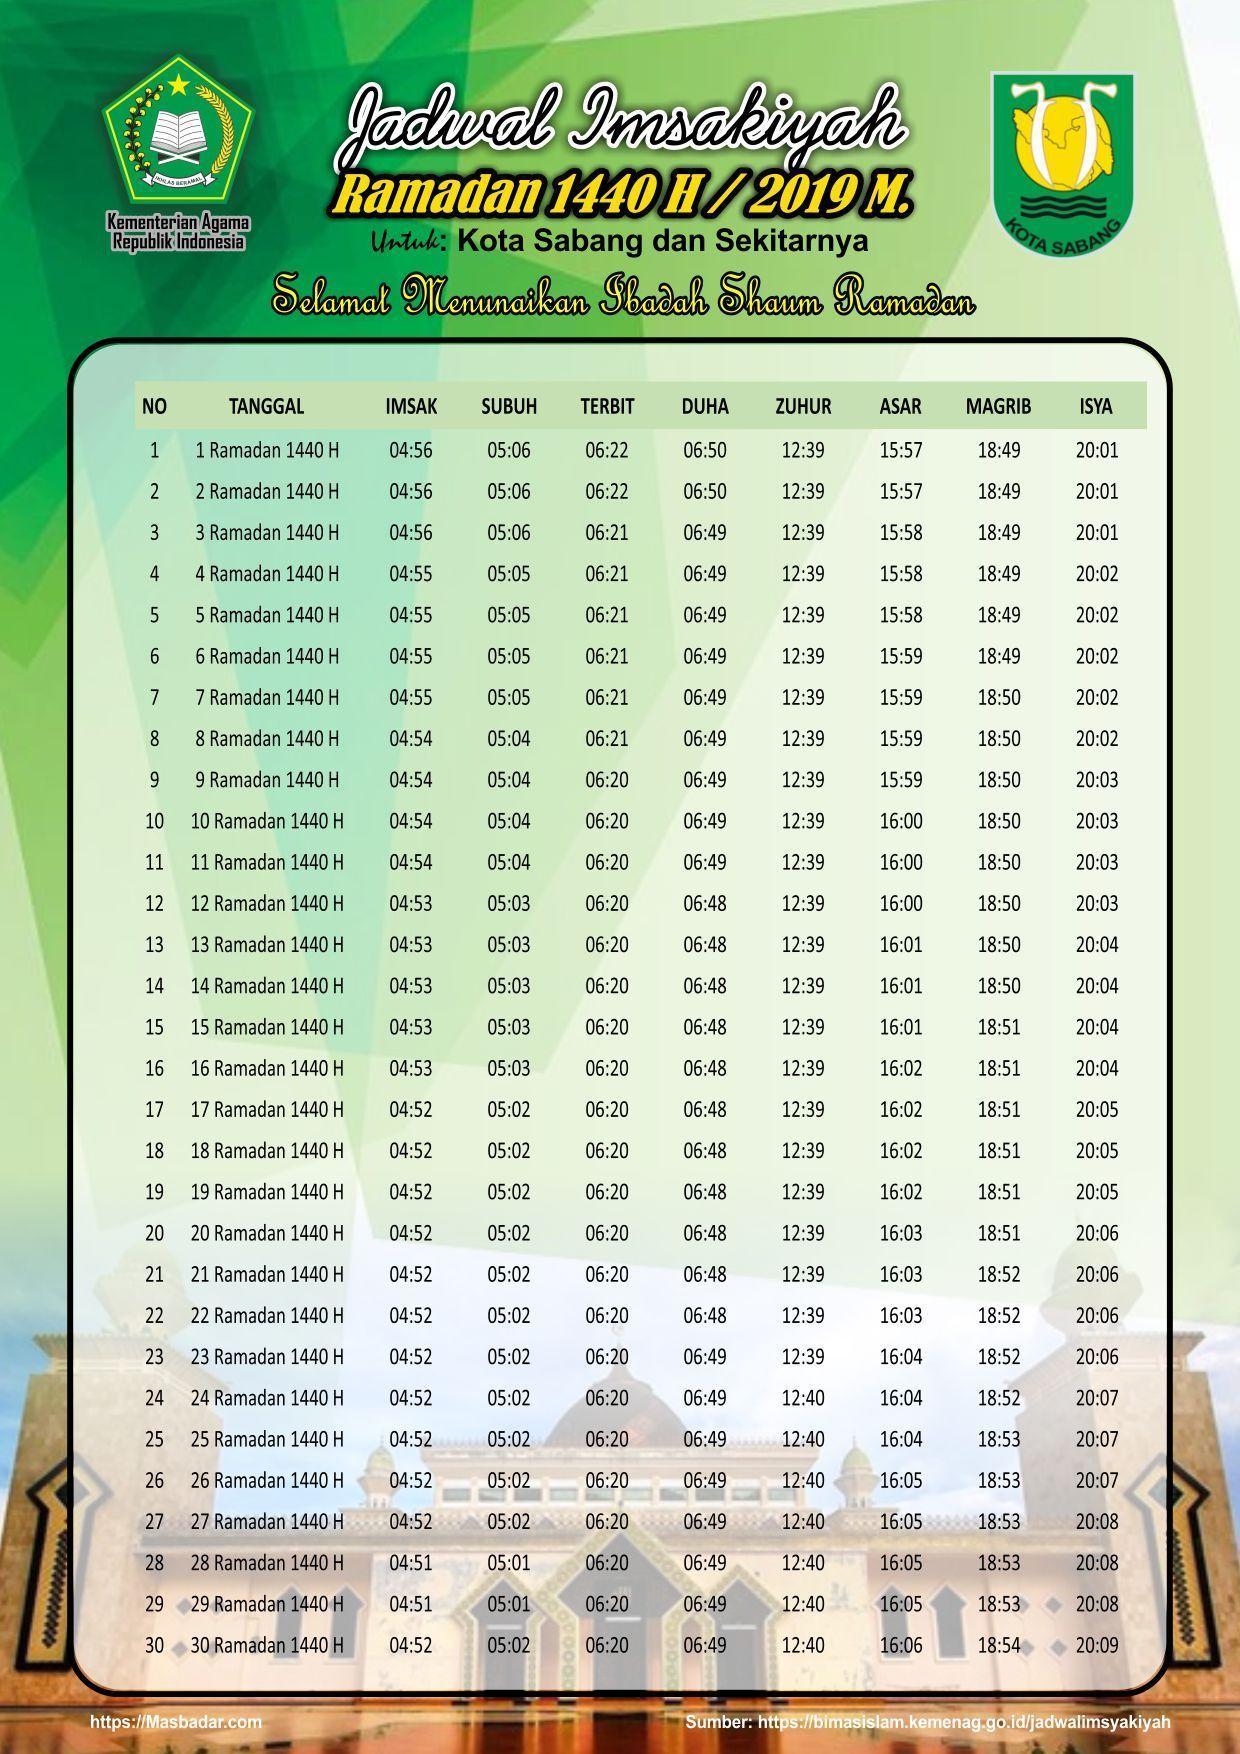 Jadwal Imsakiyah 1440 Ramadhan 2019 Aceh Kota Sabang Masbadar Com Ramadan Kota Desain Pamflet